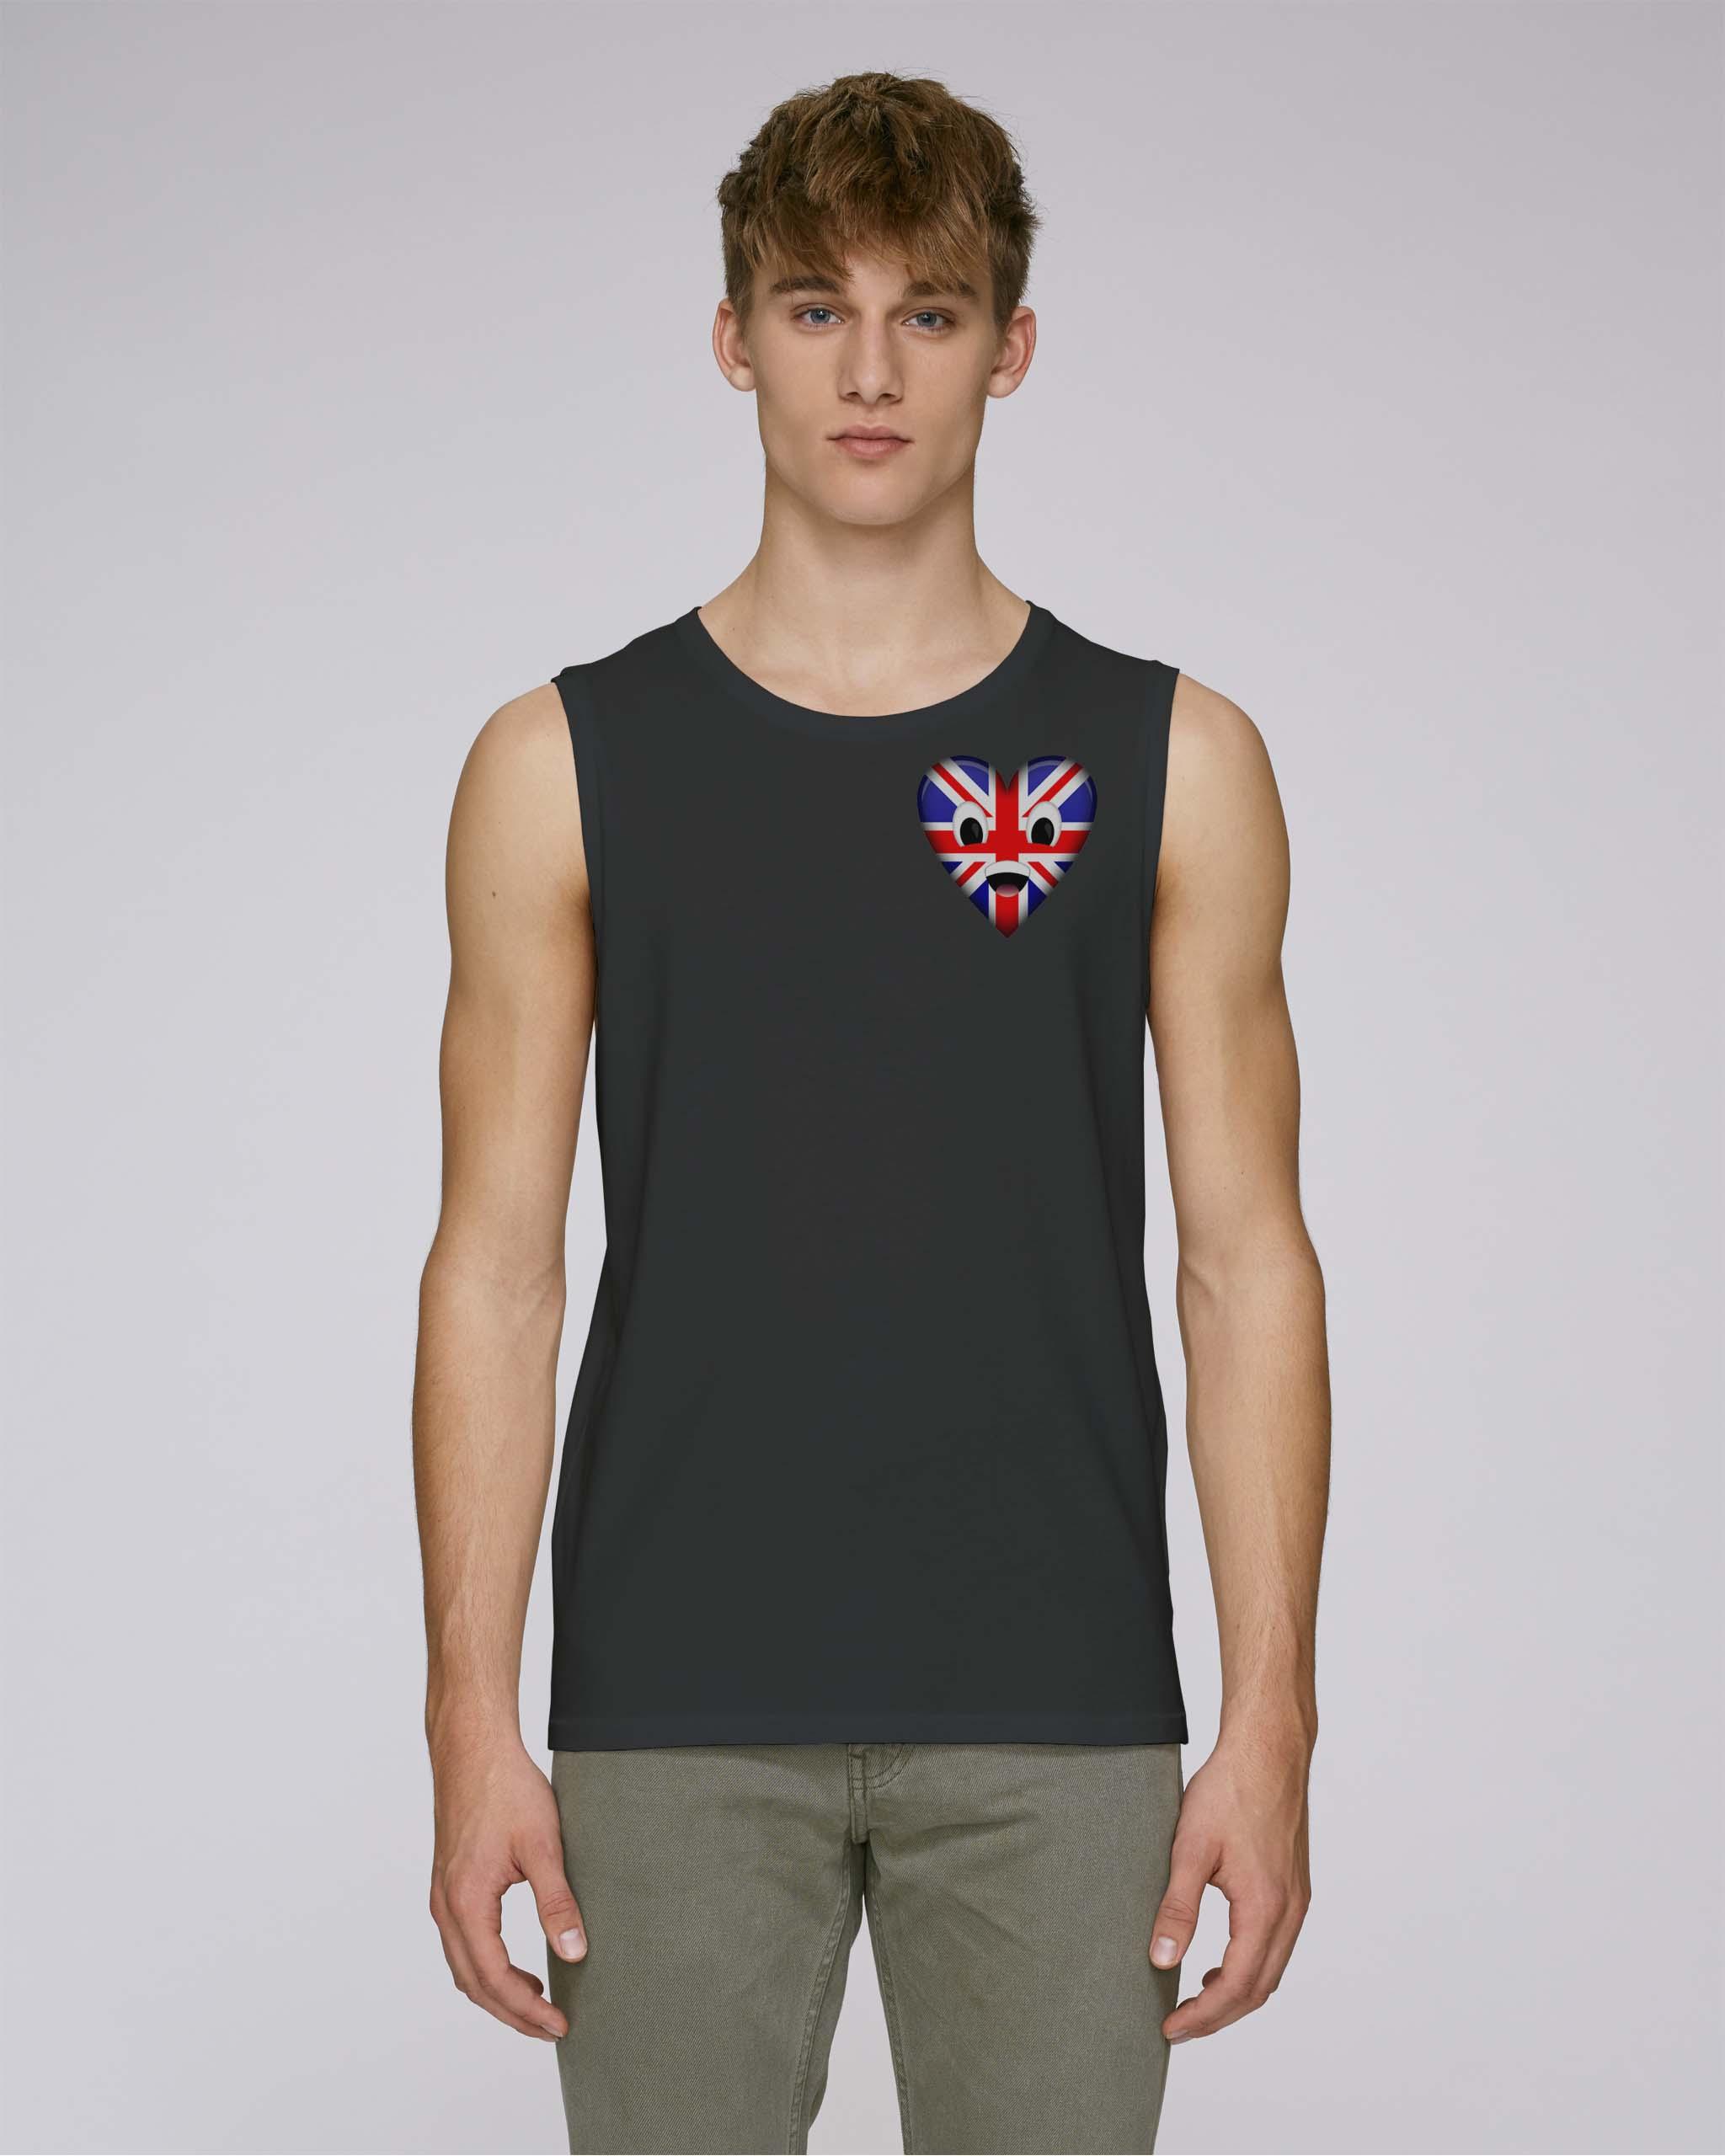 T-shirt bio noir manche courte homme - uk tee